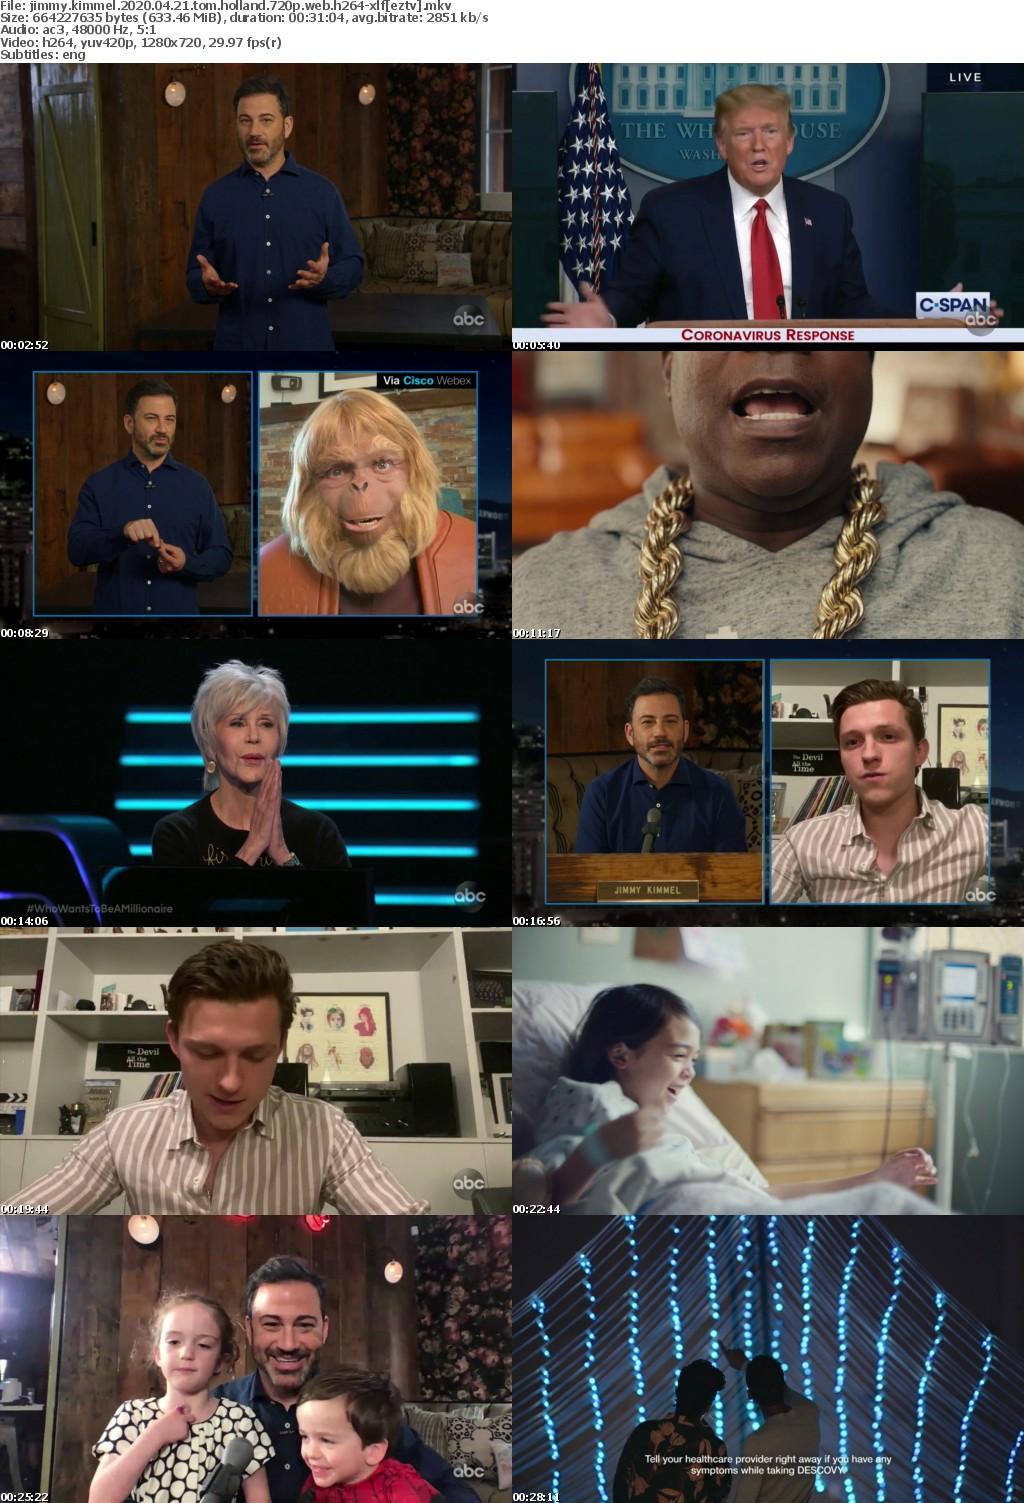 Jimmy Kimmel 2020 04 21 Tom Holland 720p WEB H264-XLF